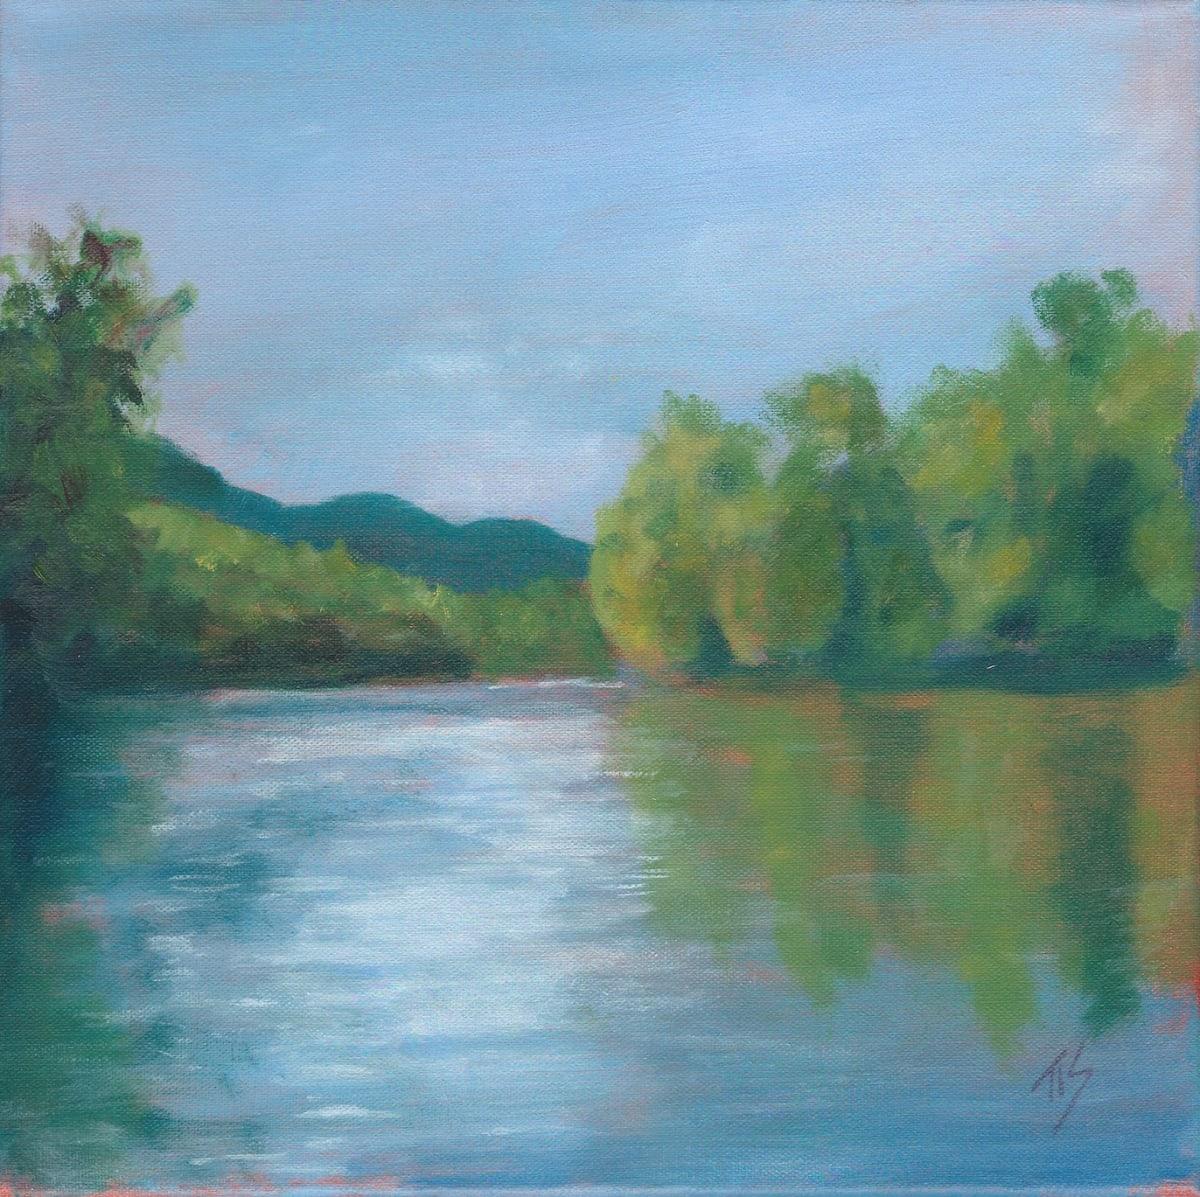 James River View IV by Thomas Stevens